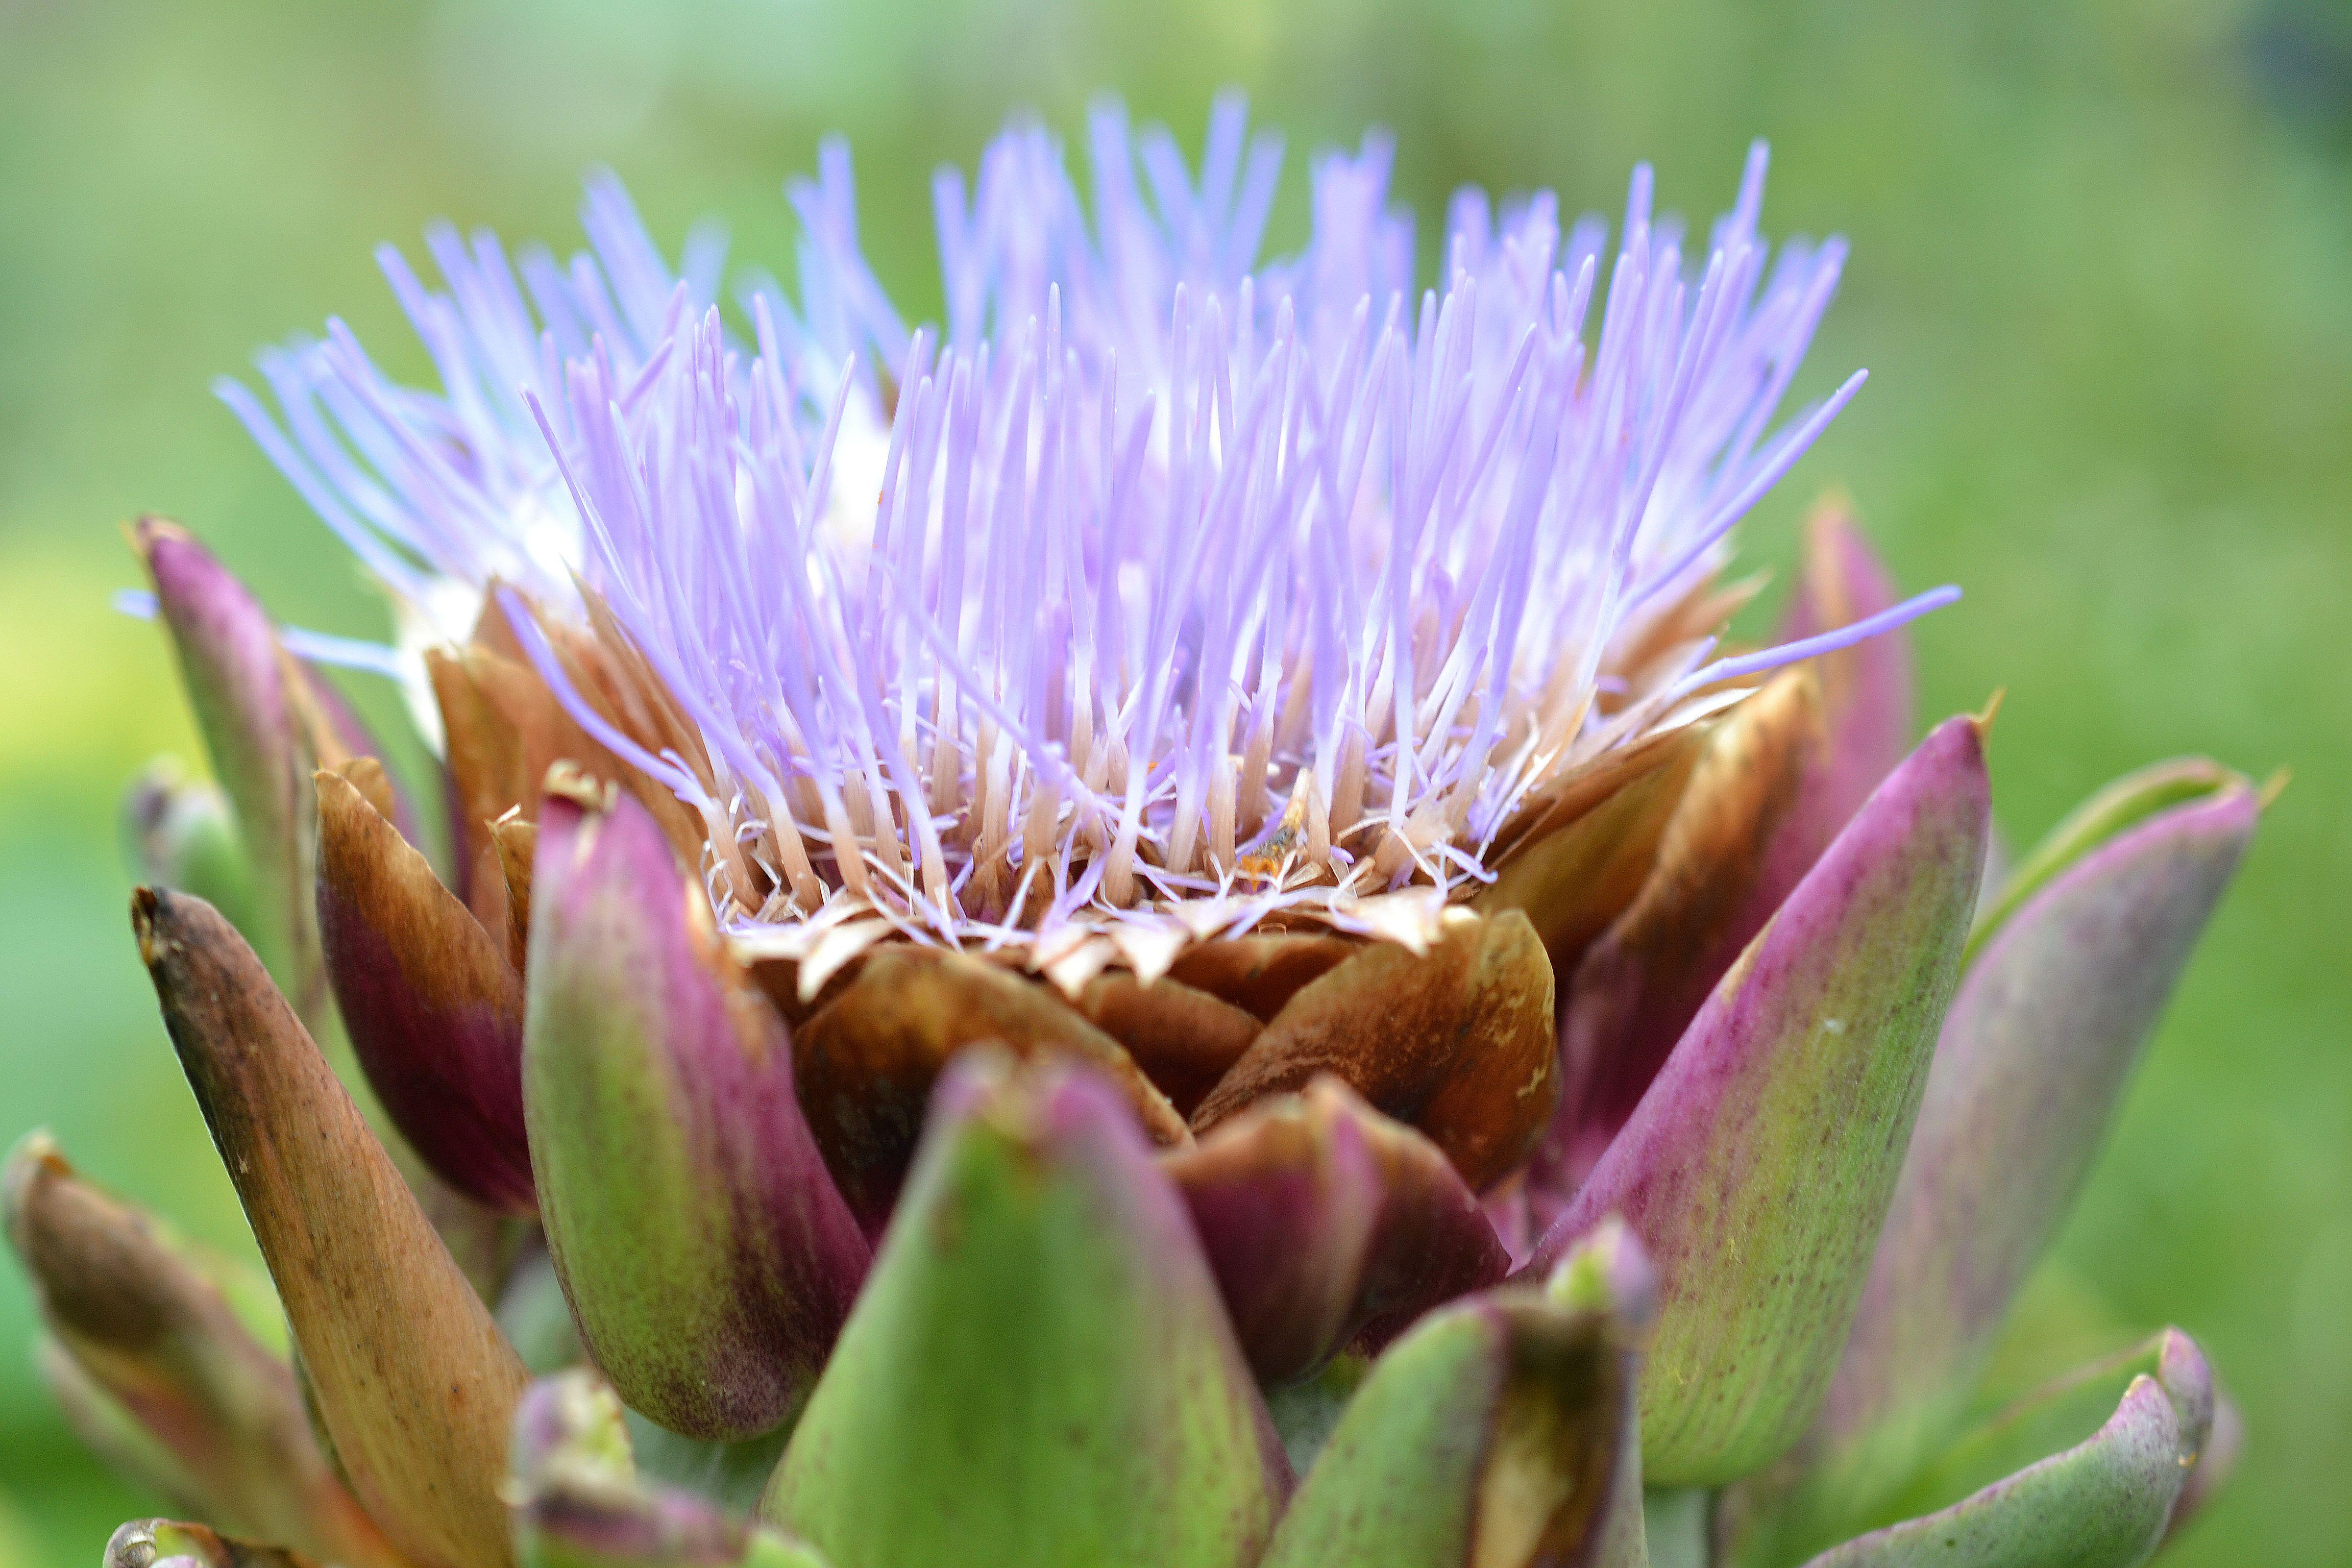 En vacker lila blomma som slår ut ur en taggig stor tistelknopp - kronärtskocka. January sowings, a purple flower.